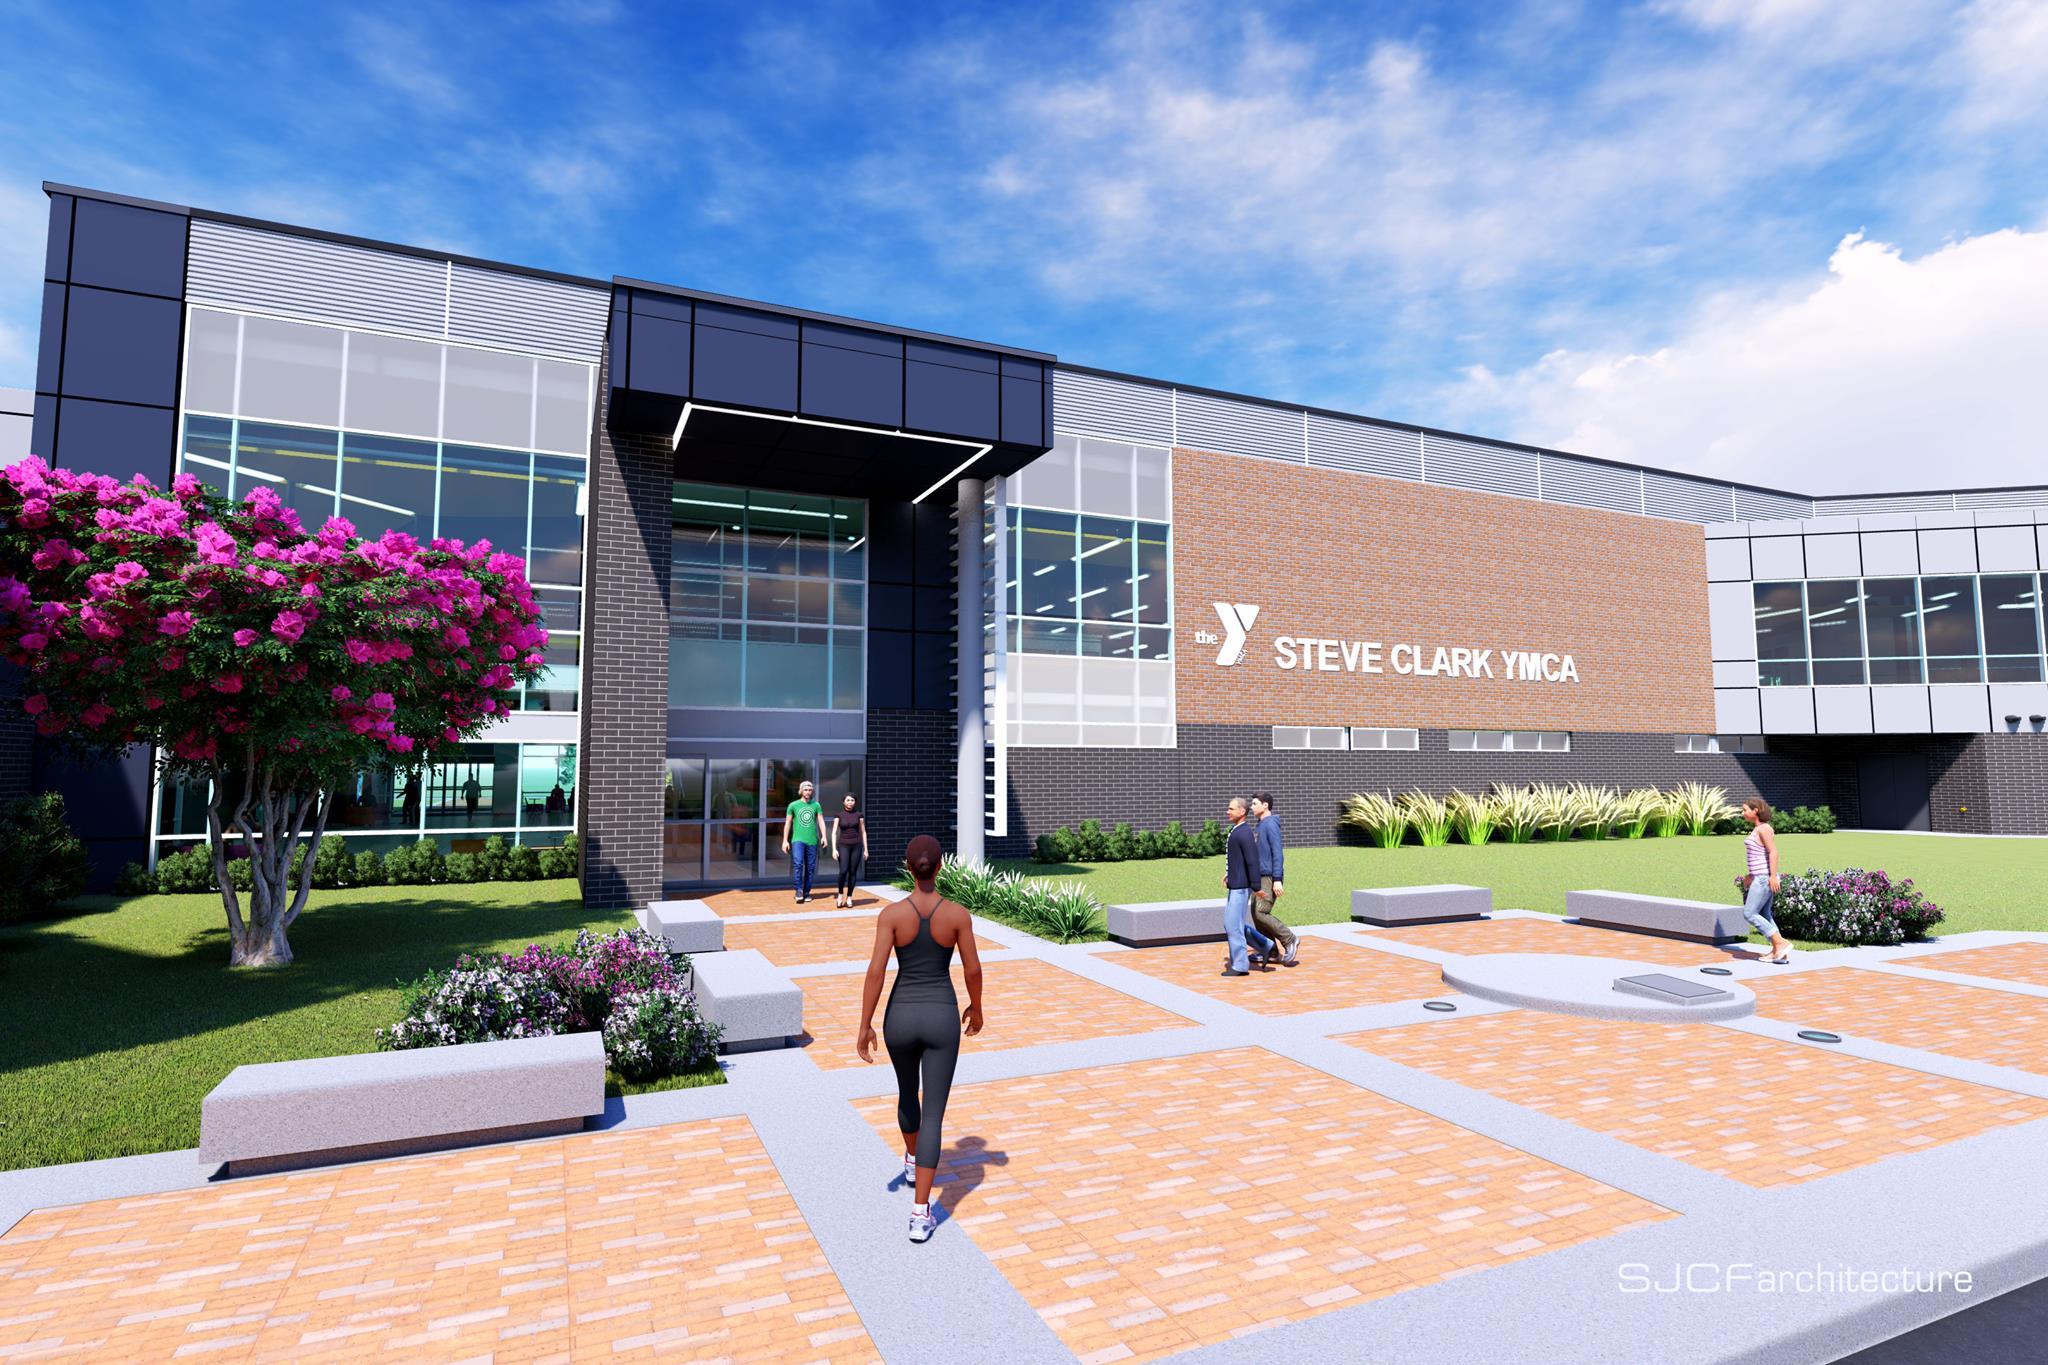 Steve Clark YMCA_1545322975347.jpg.jpg